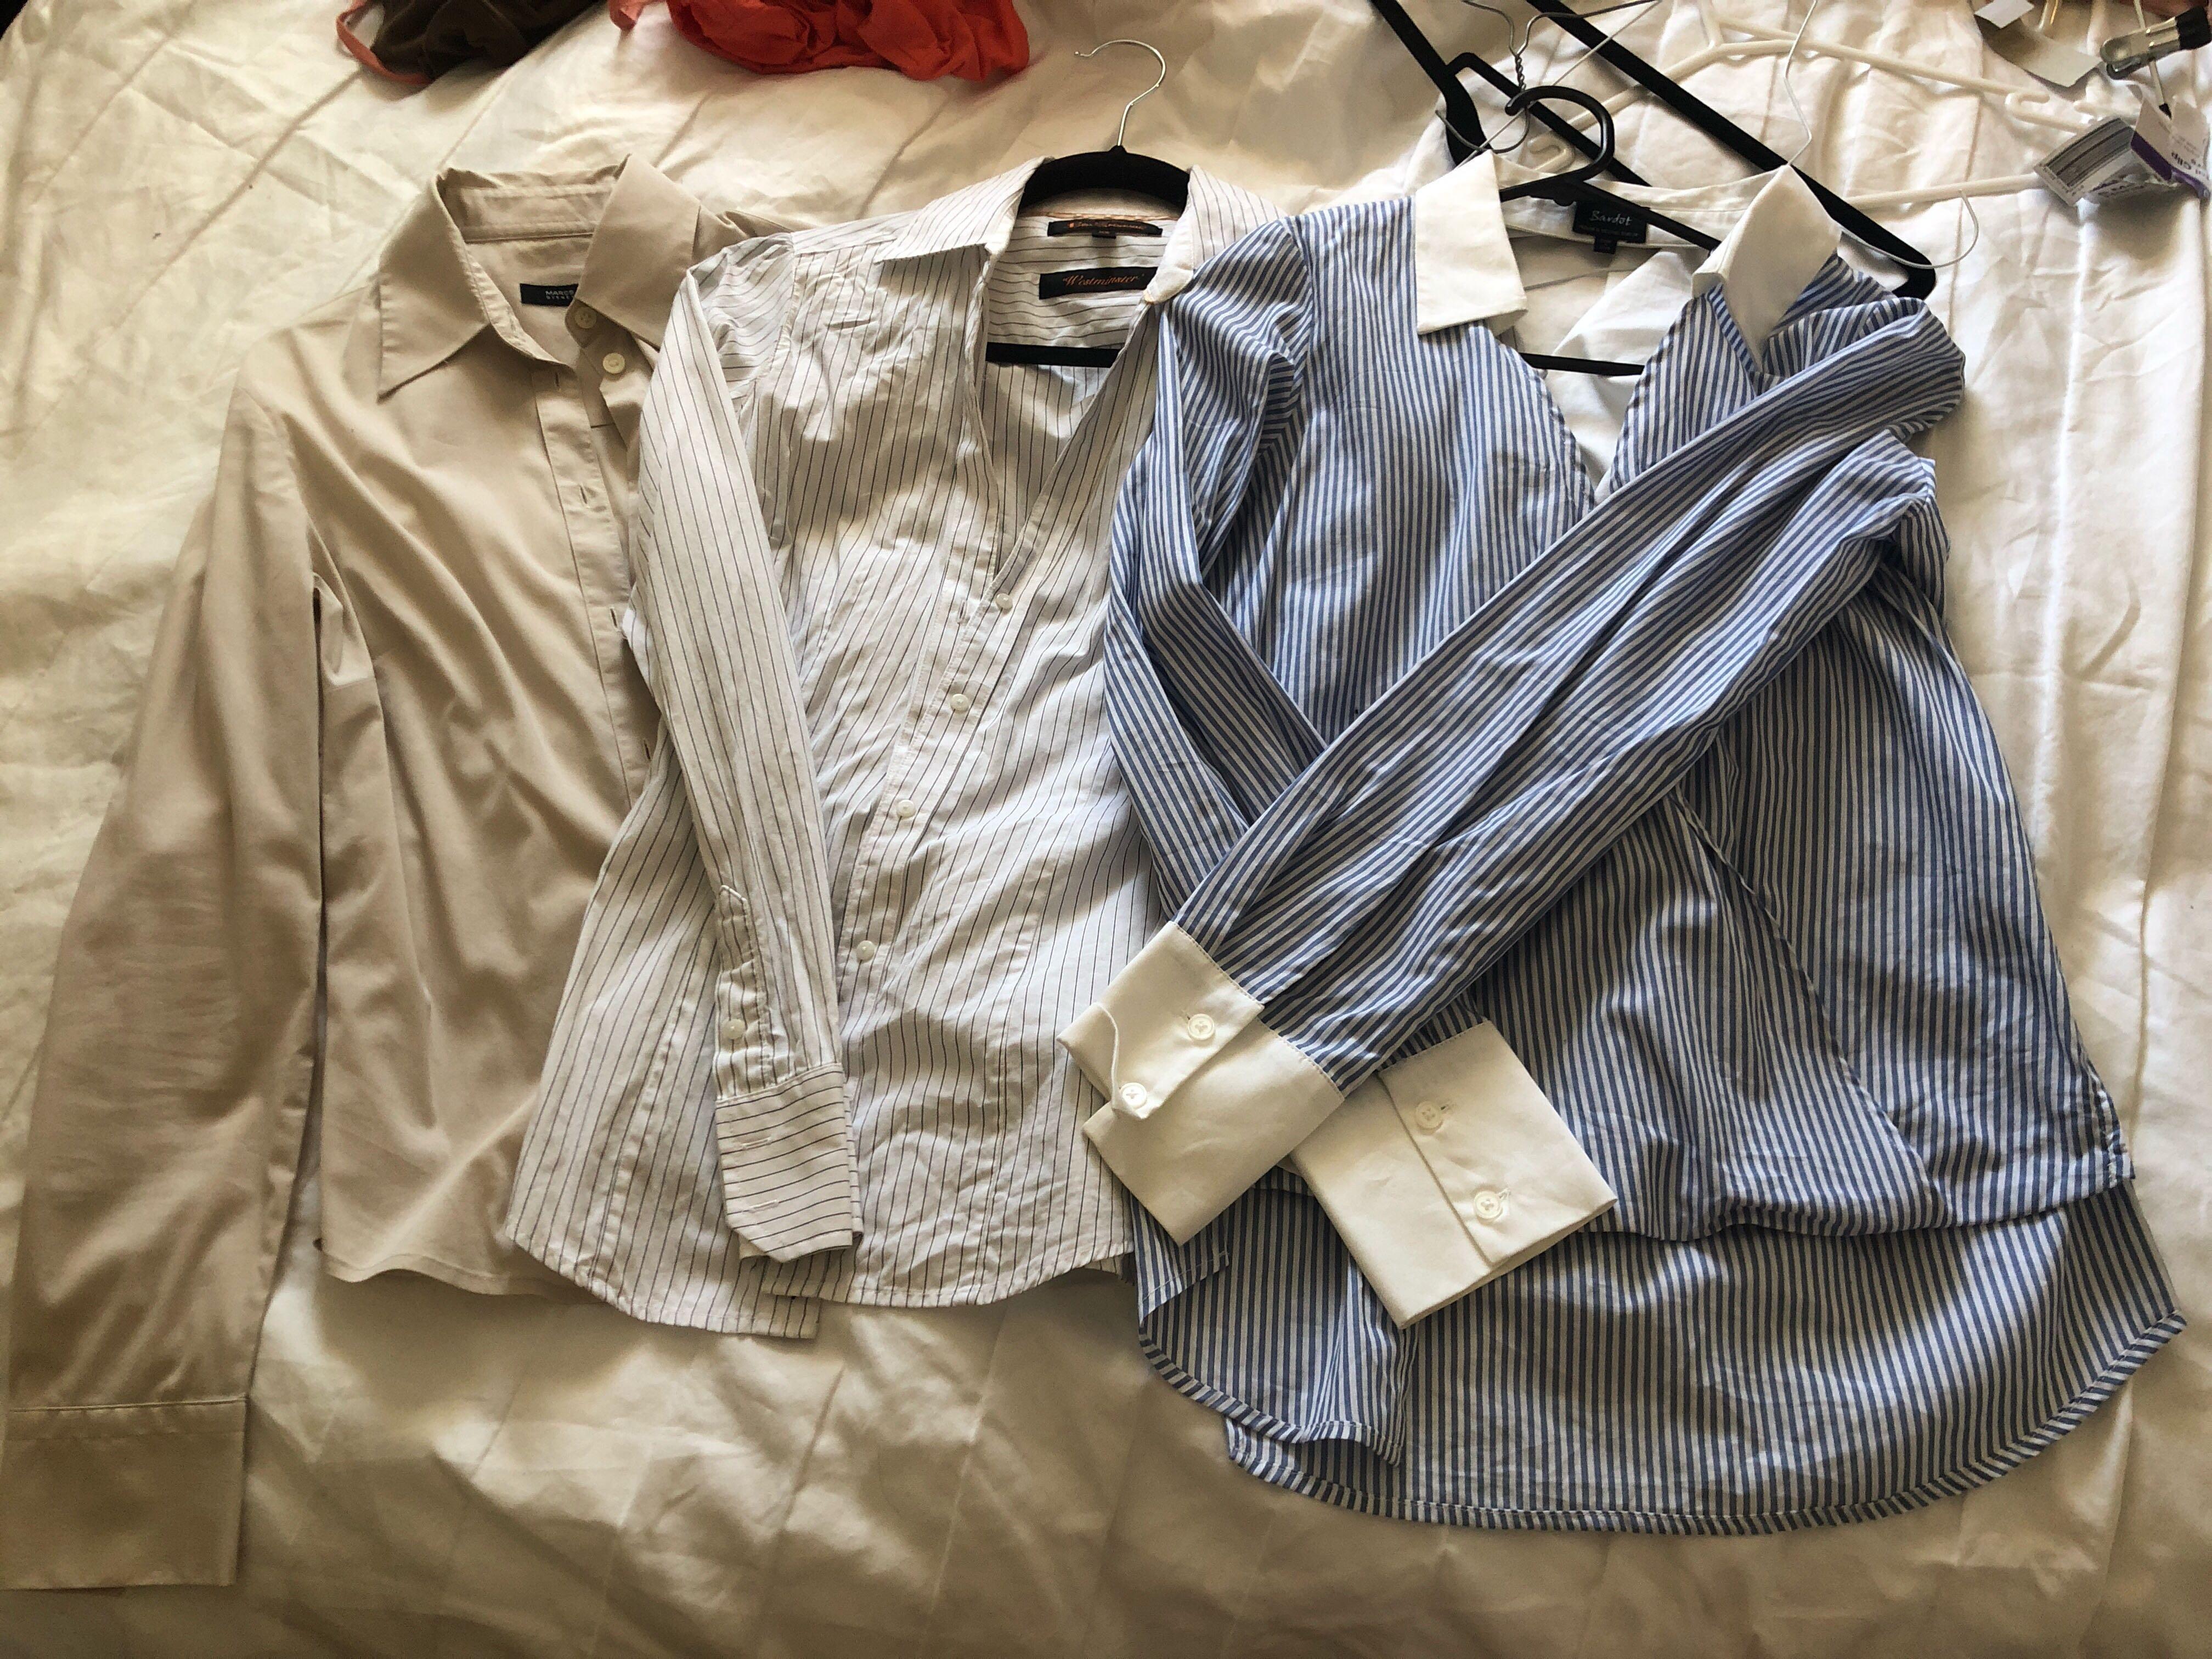 3 designer women's work shirts